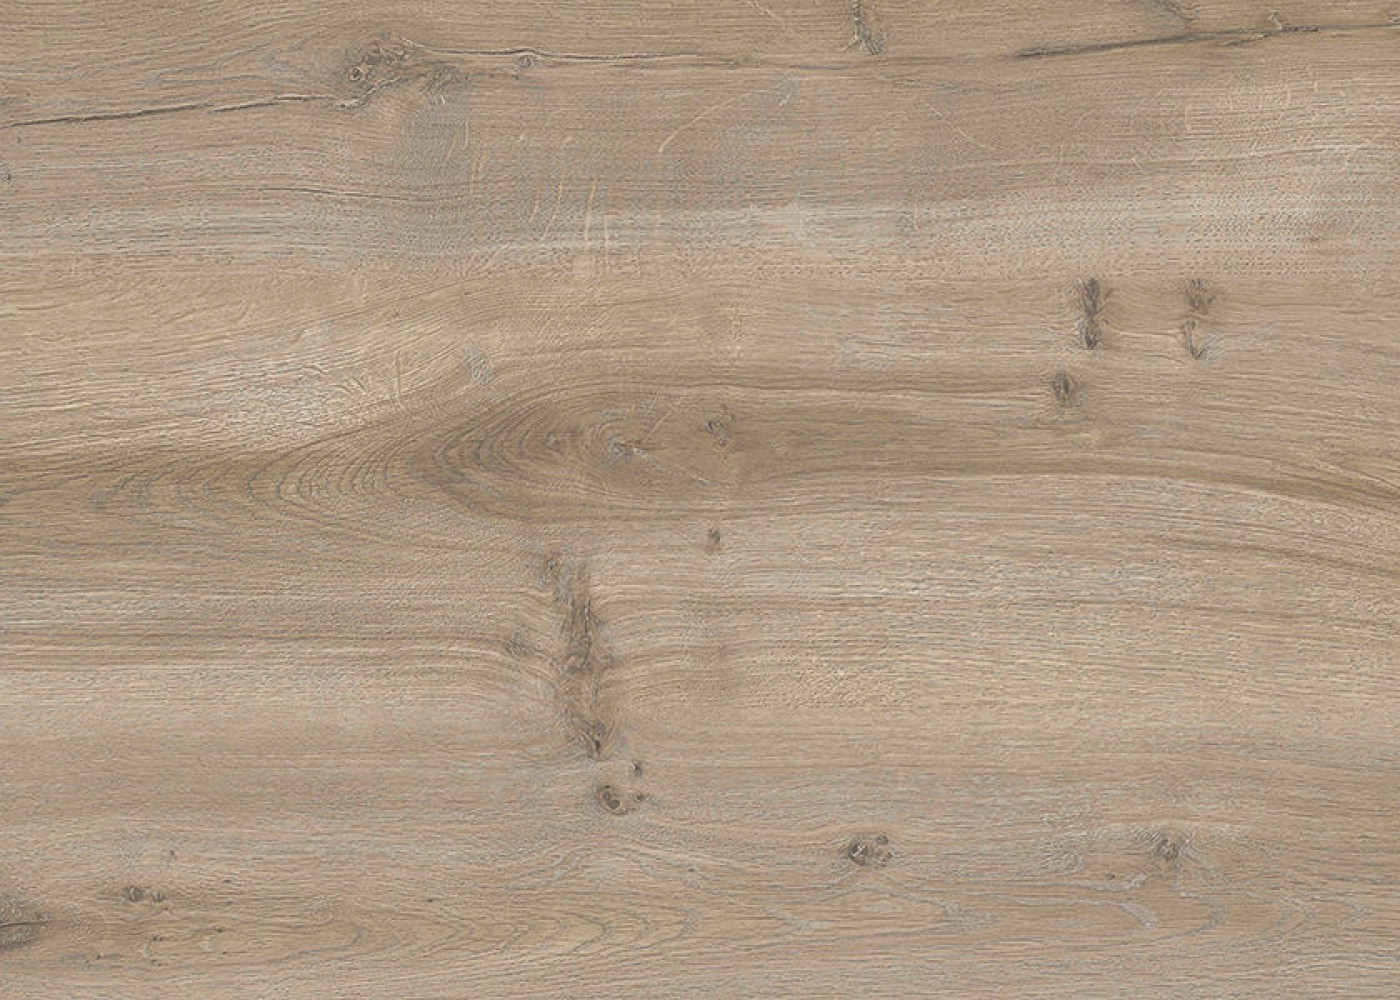 Sol stratifié Chêne Spirit Brun Clair - Finesse 8 G4 - 8x155x1288